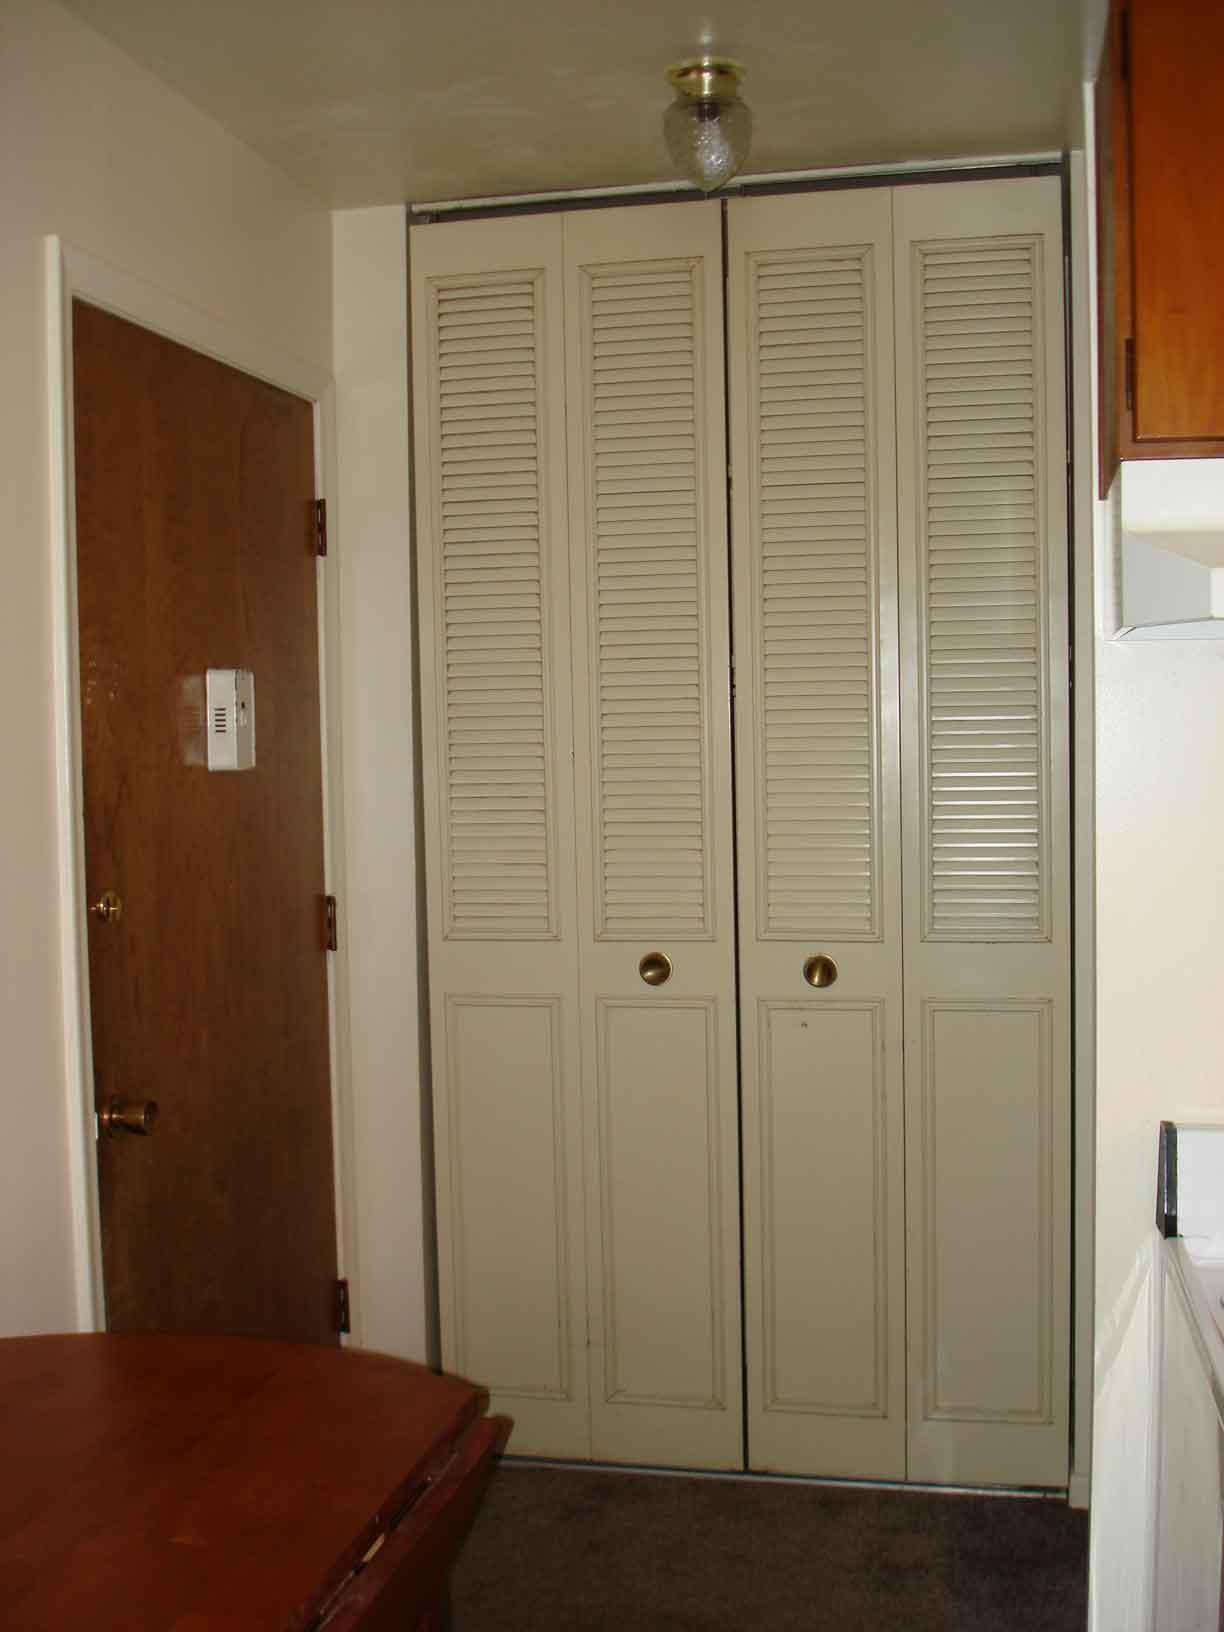 Stoddard Apartments Prime Housing Group